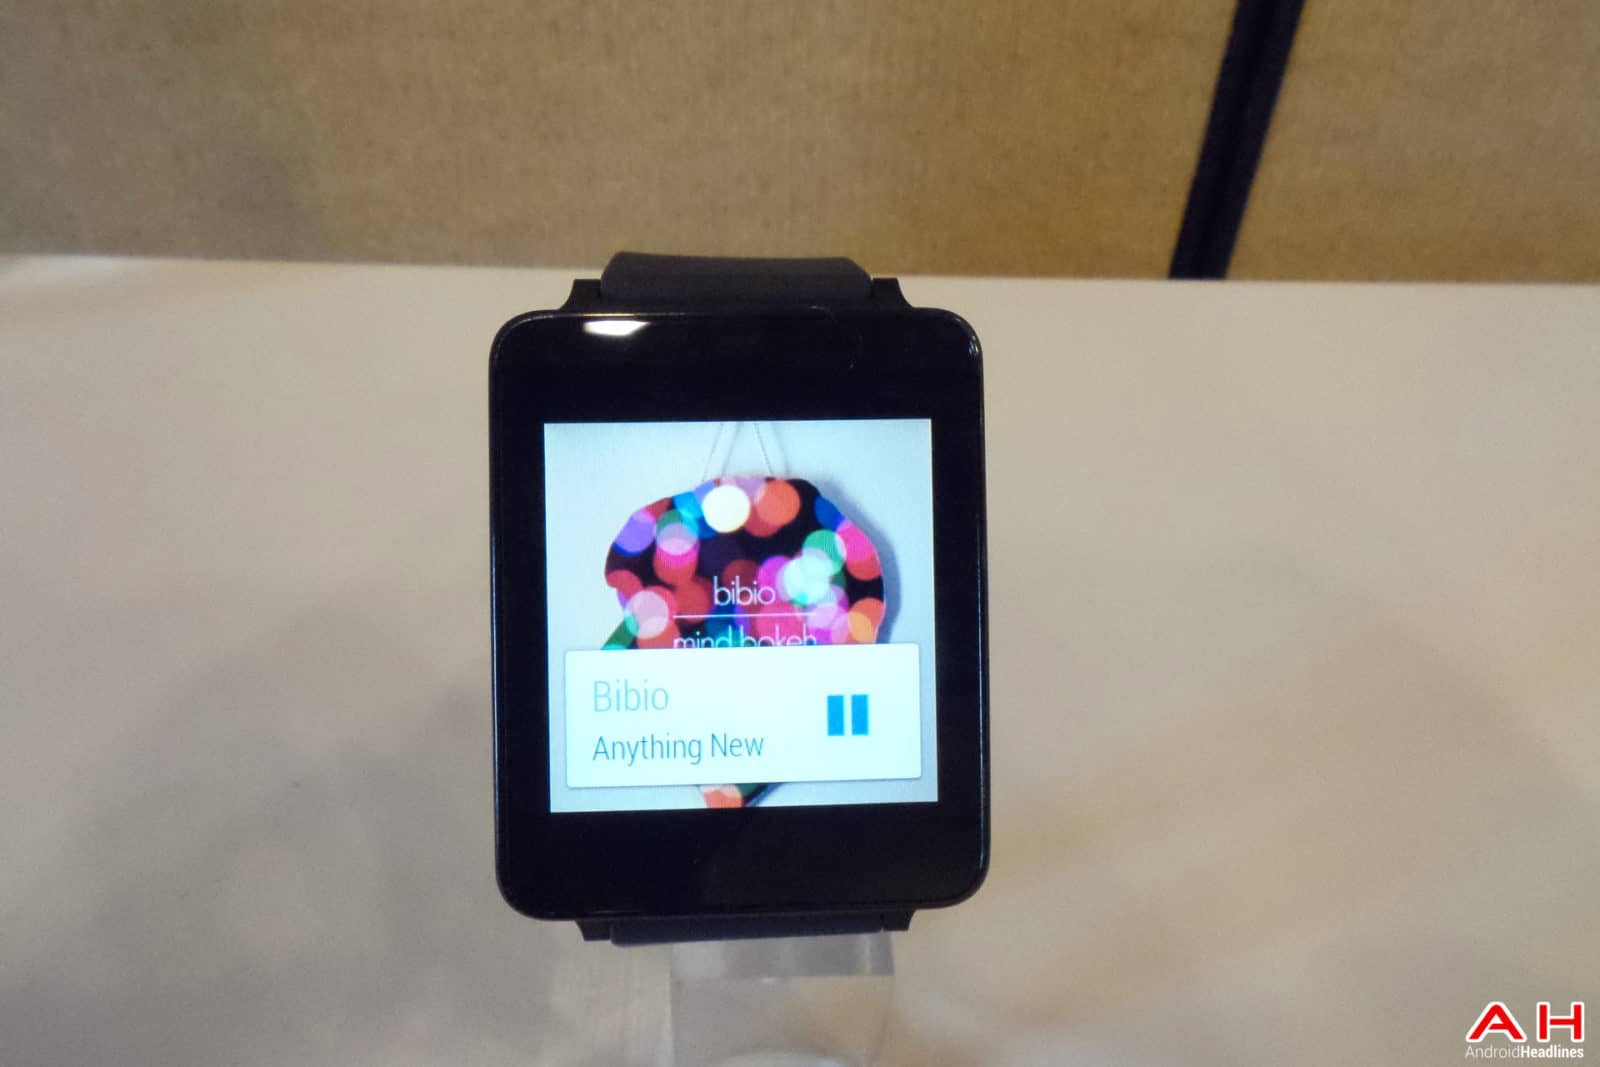 AH Google IO 2014 LG G Watch (2 of 10)